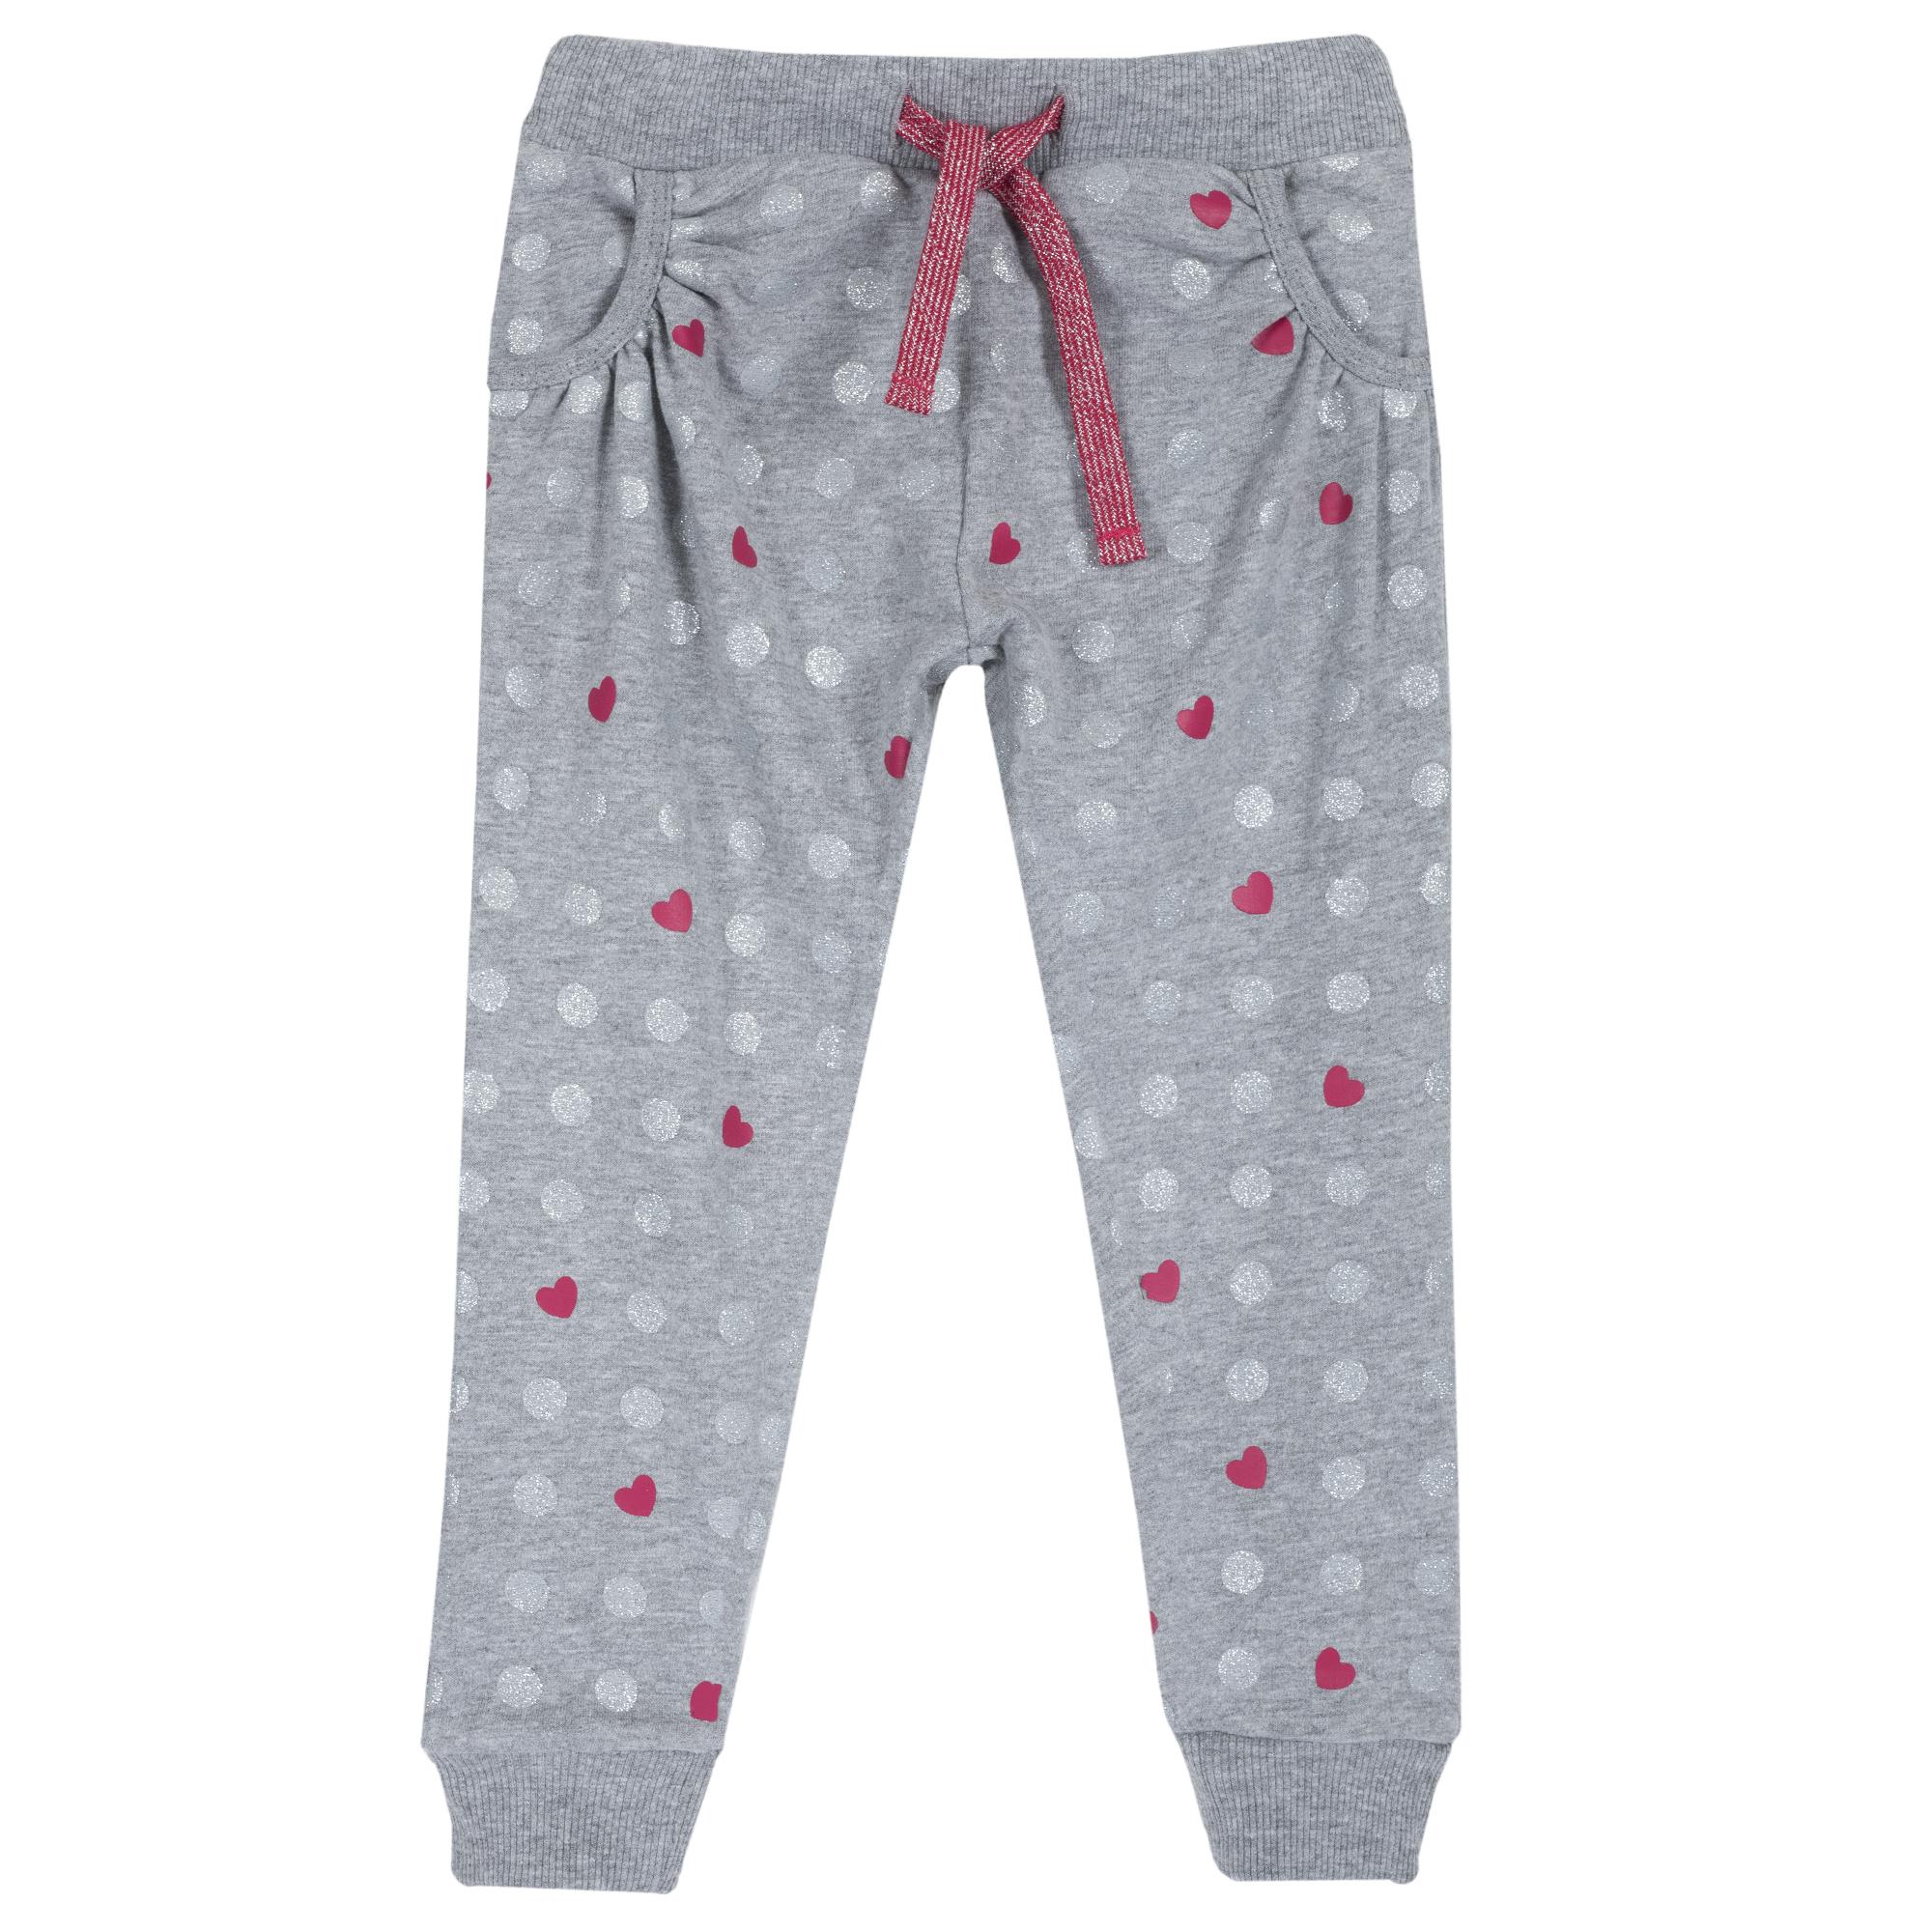 Pantaloni copii Chicco, gri cu rosu, 08019 din categoria Pantaloni copii